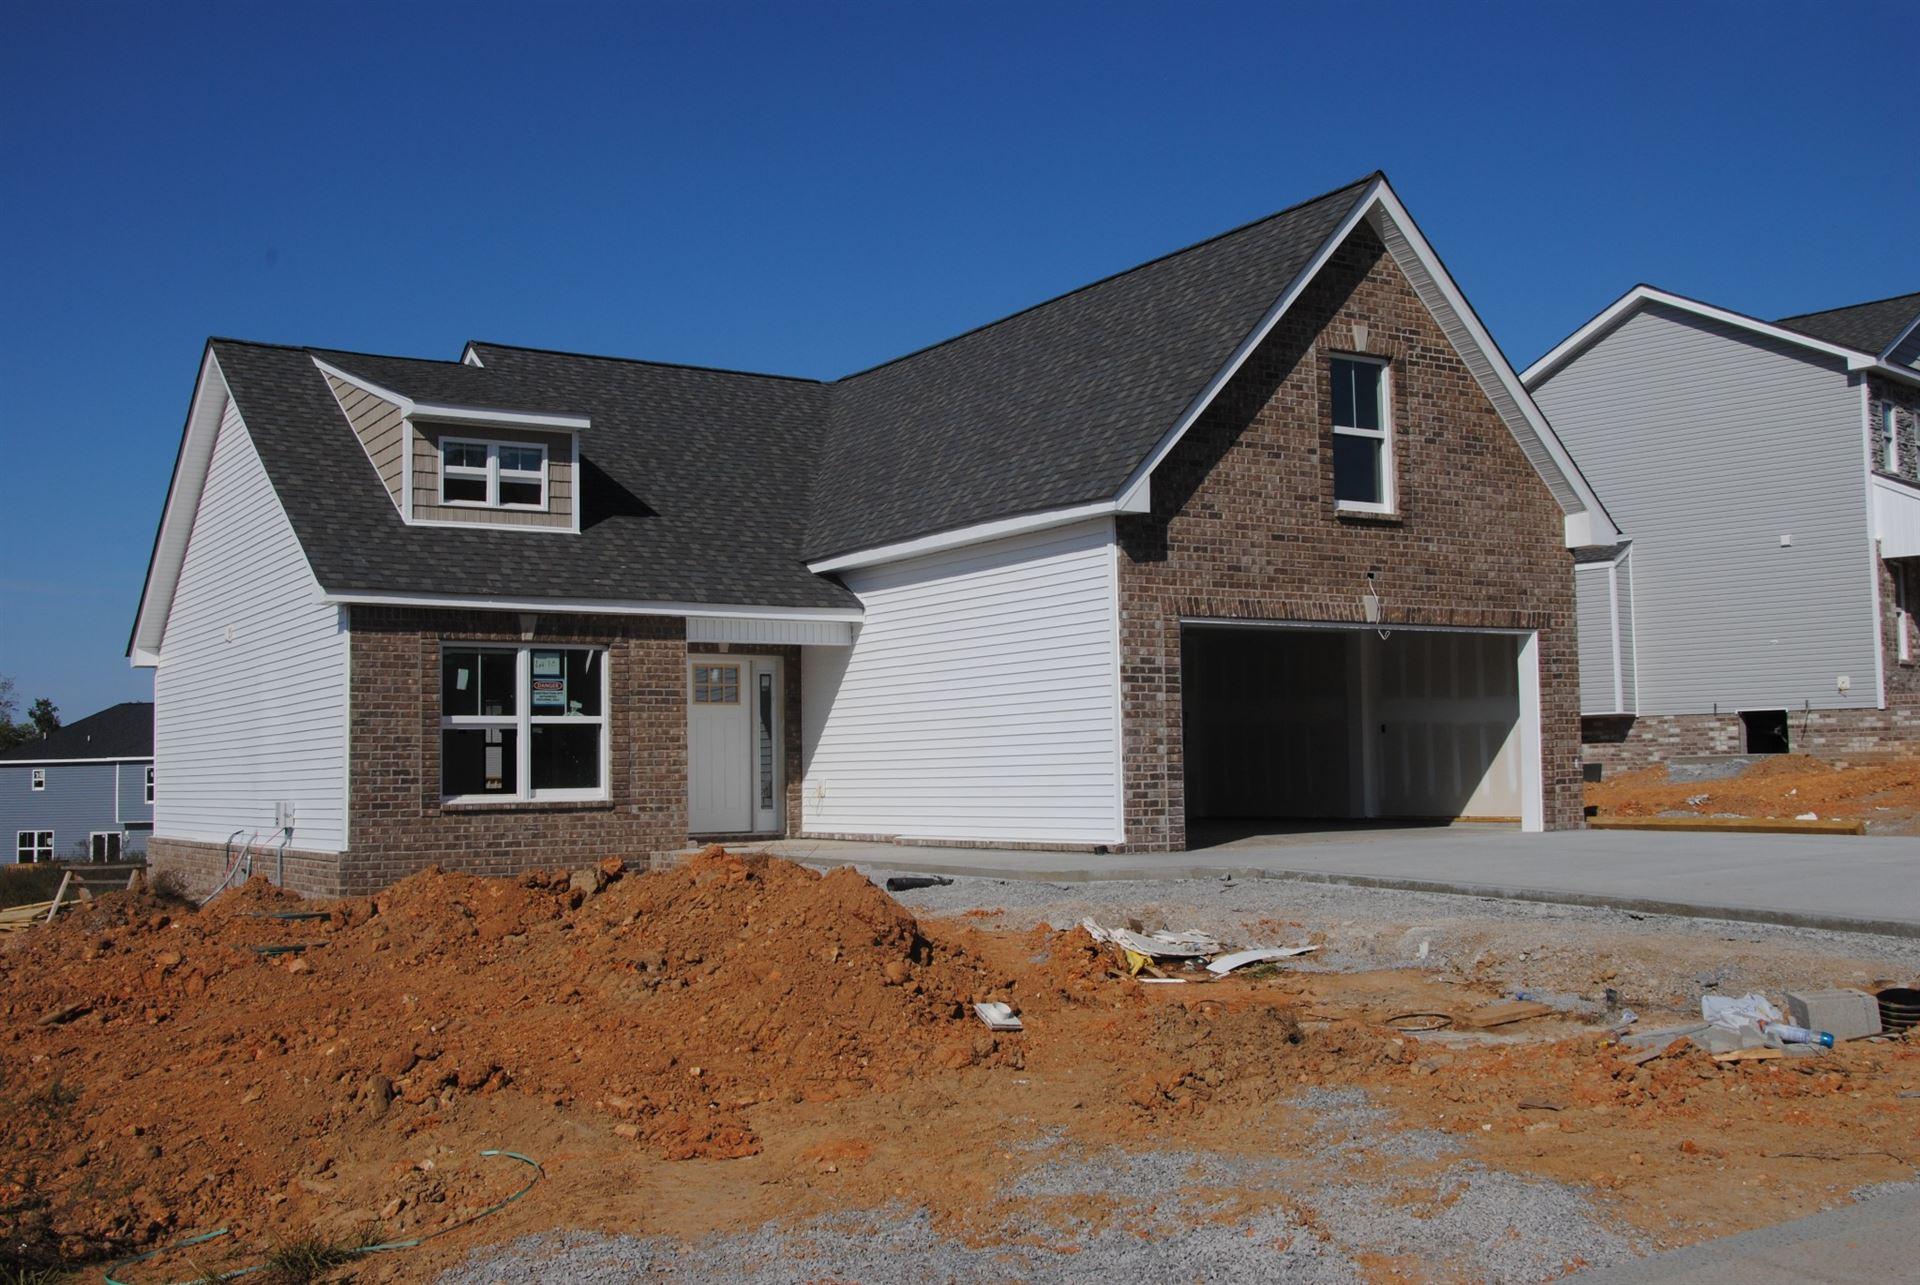 125 Tomahawk Pointe, Clarksville, TN 37040 - MLS#: 2184443